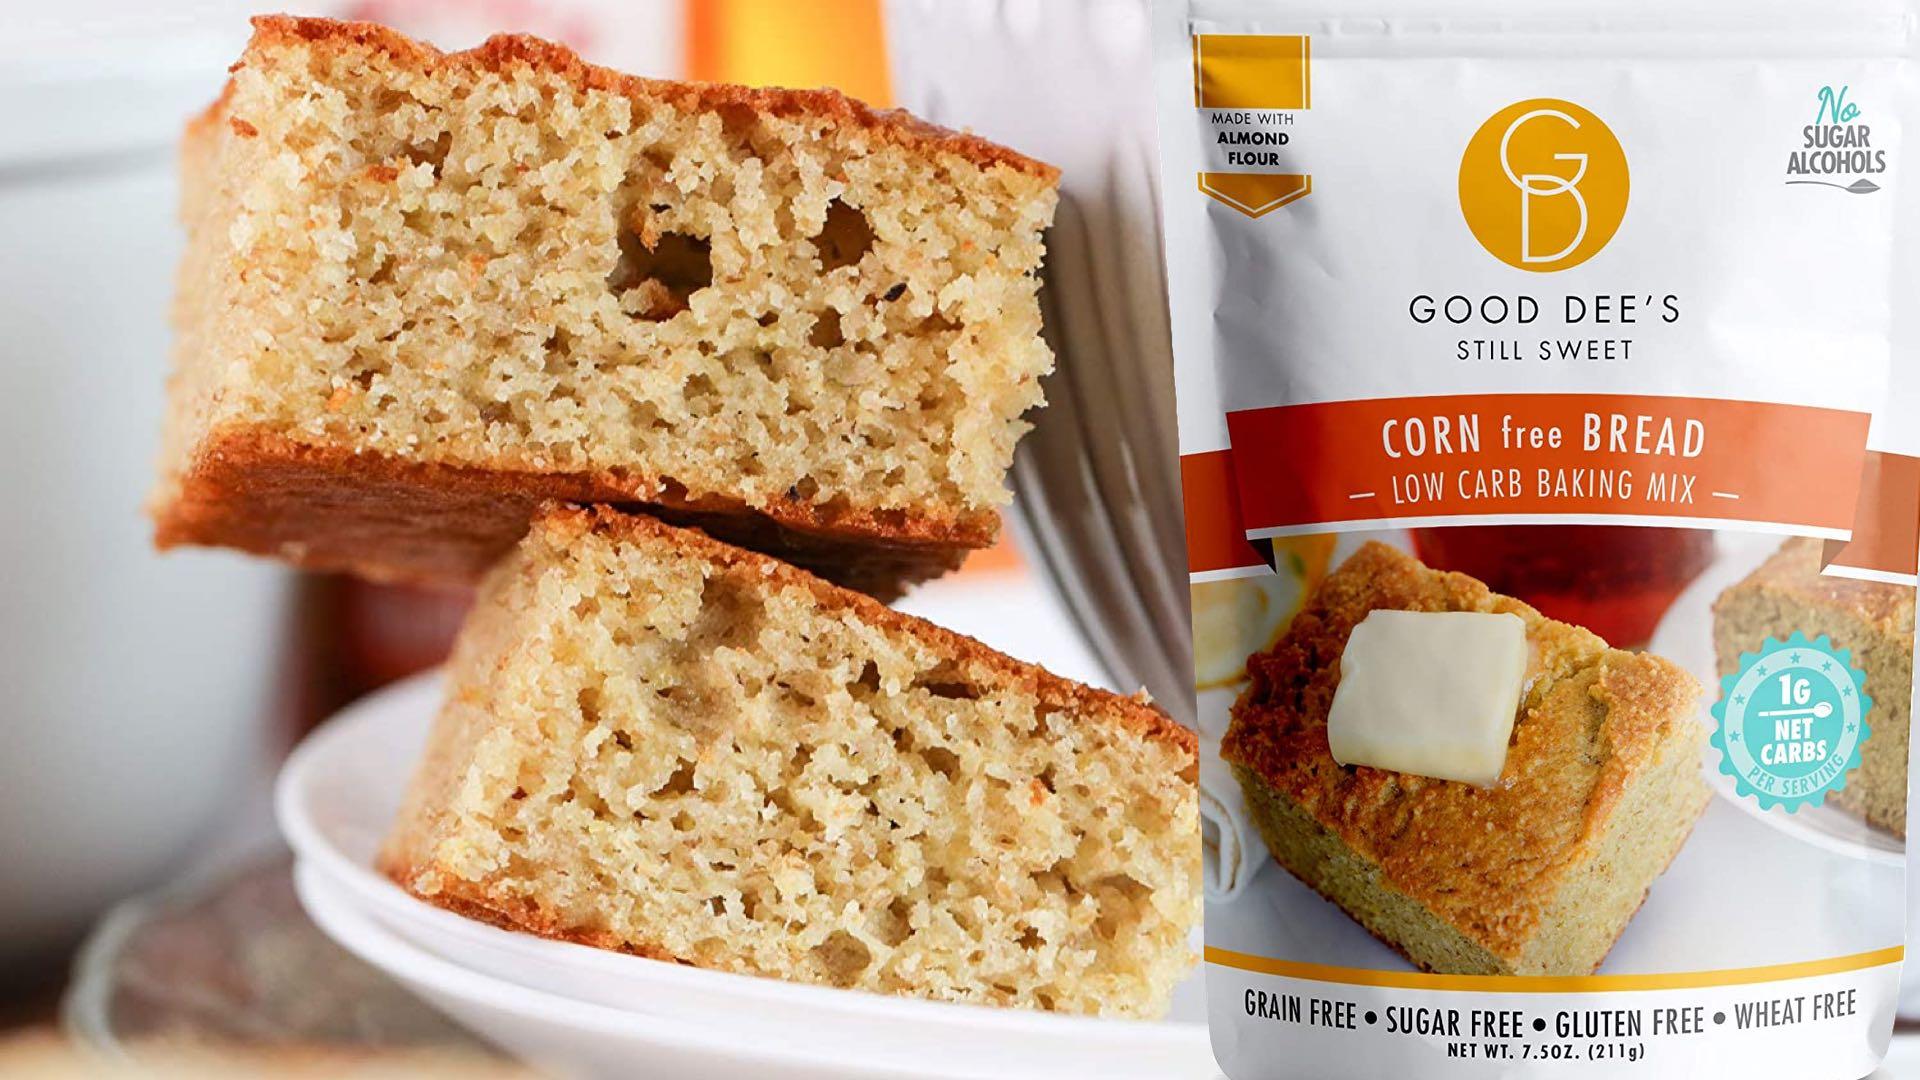 Good Dee's Corn Bread Grain-Free, Low-Carb, Sugar-Free, Gluten-Free, Wheat Free Baking Mix